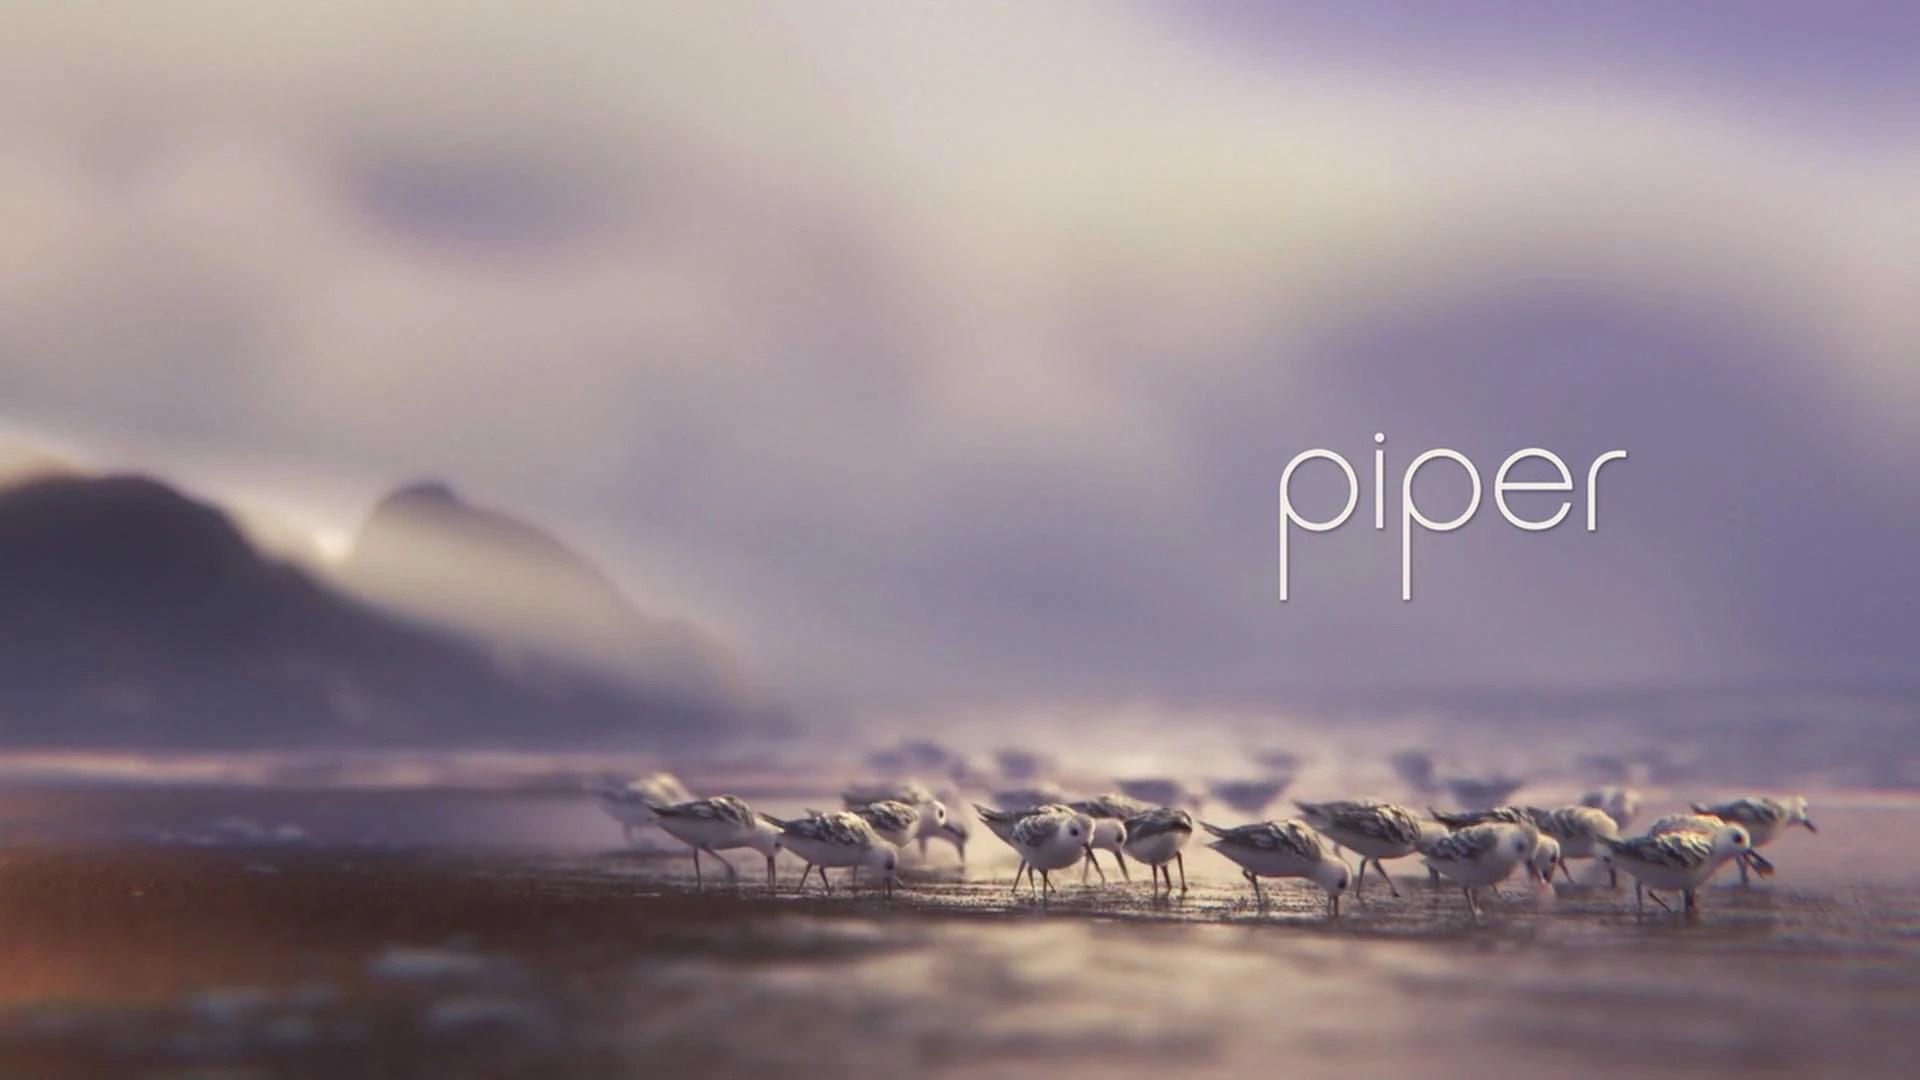 Frozen Animated Wallpaper Piper Disney Wiki Fandom Powered By Wikia